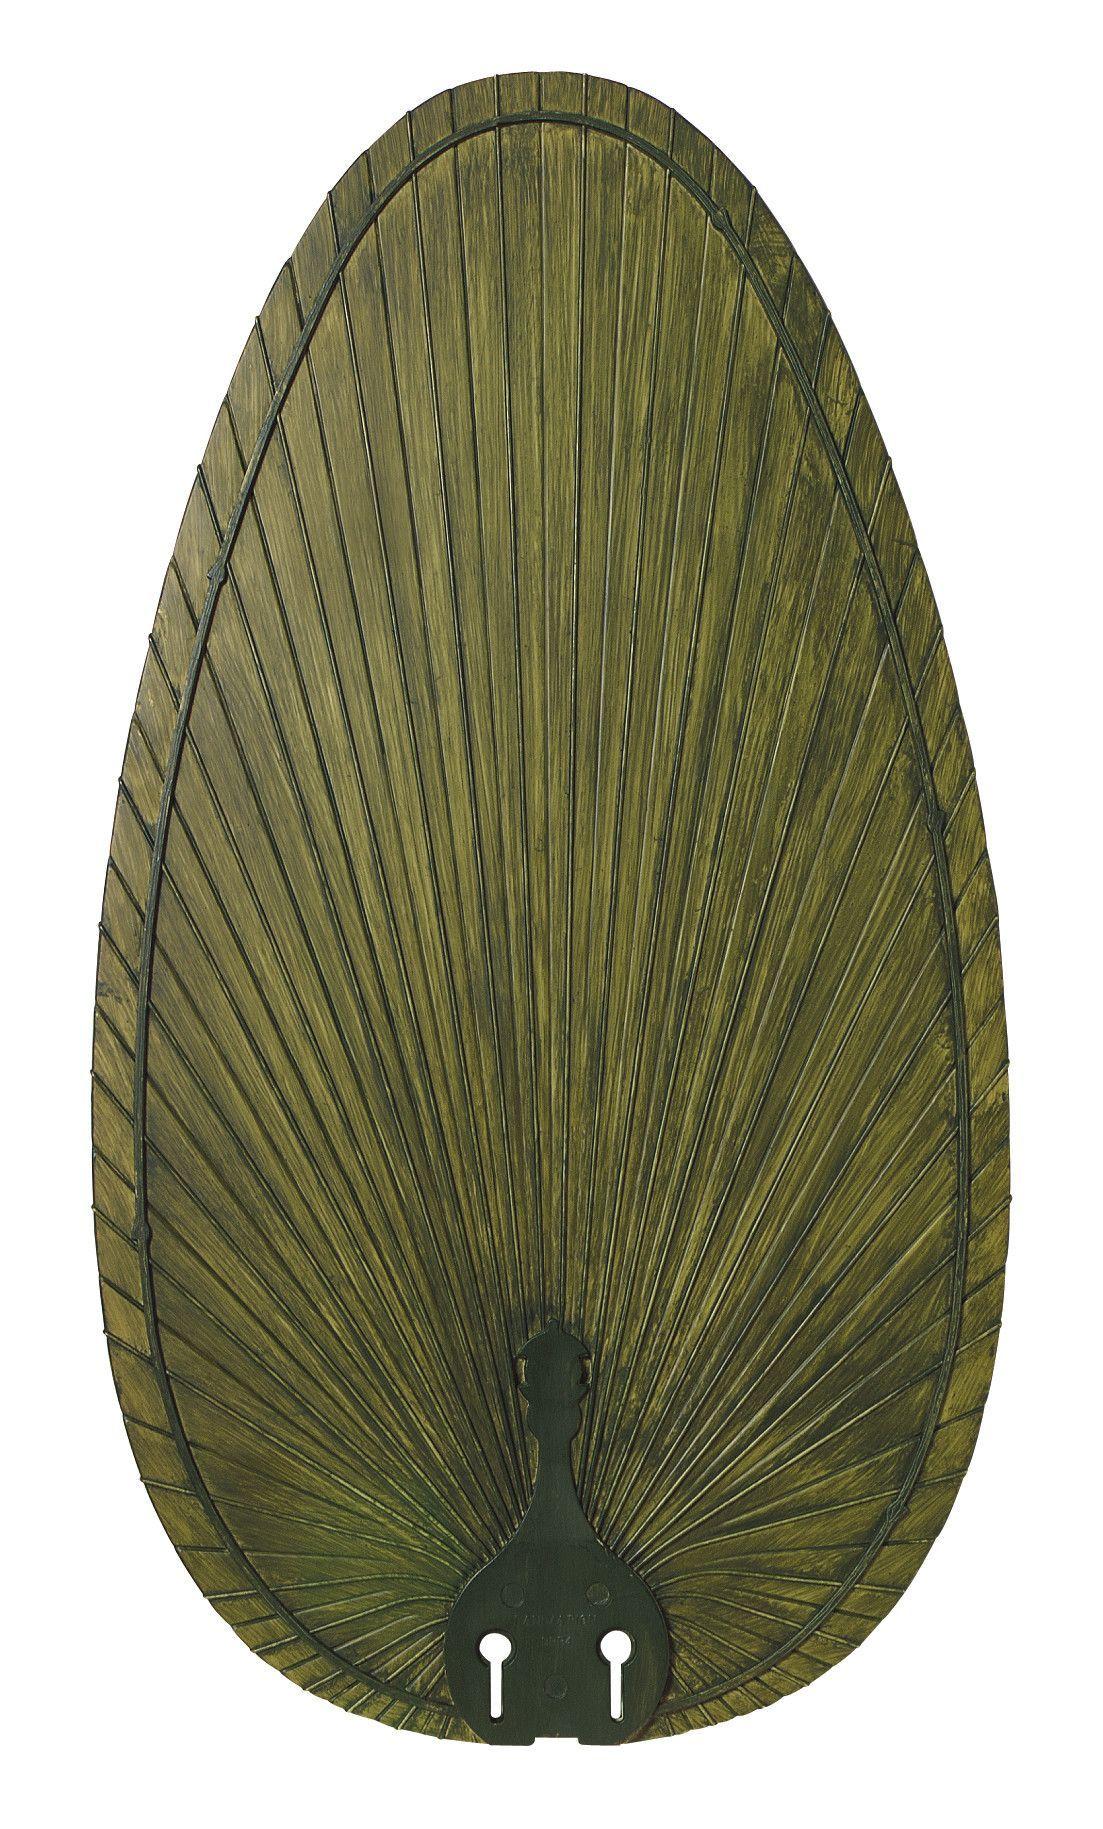 Narrow Oval Palm Leaf Outdoor Ceiling Fan Blade